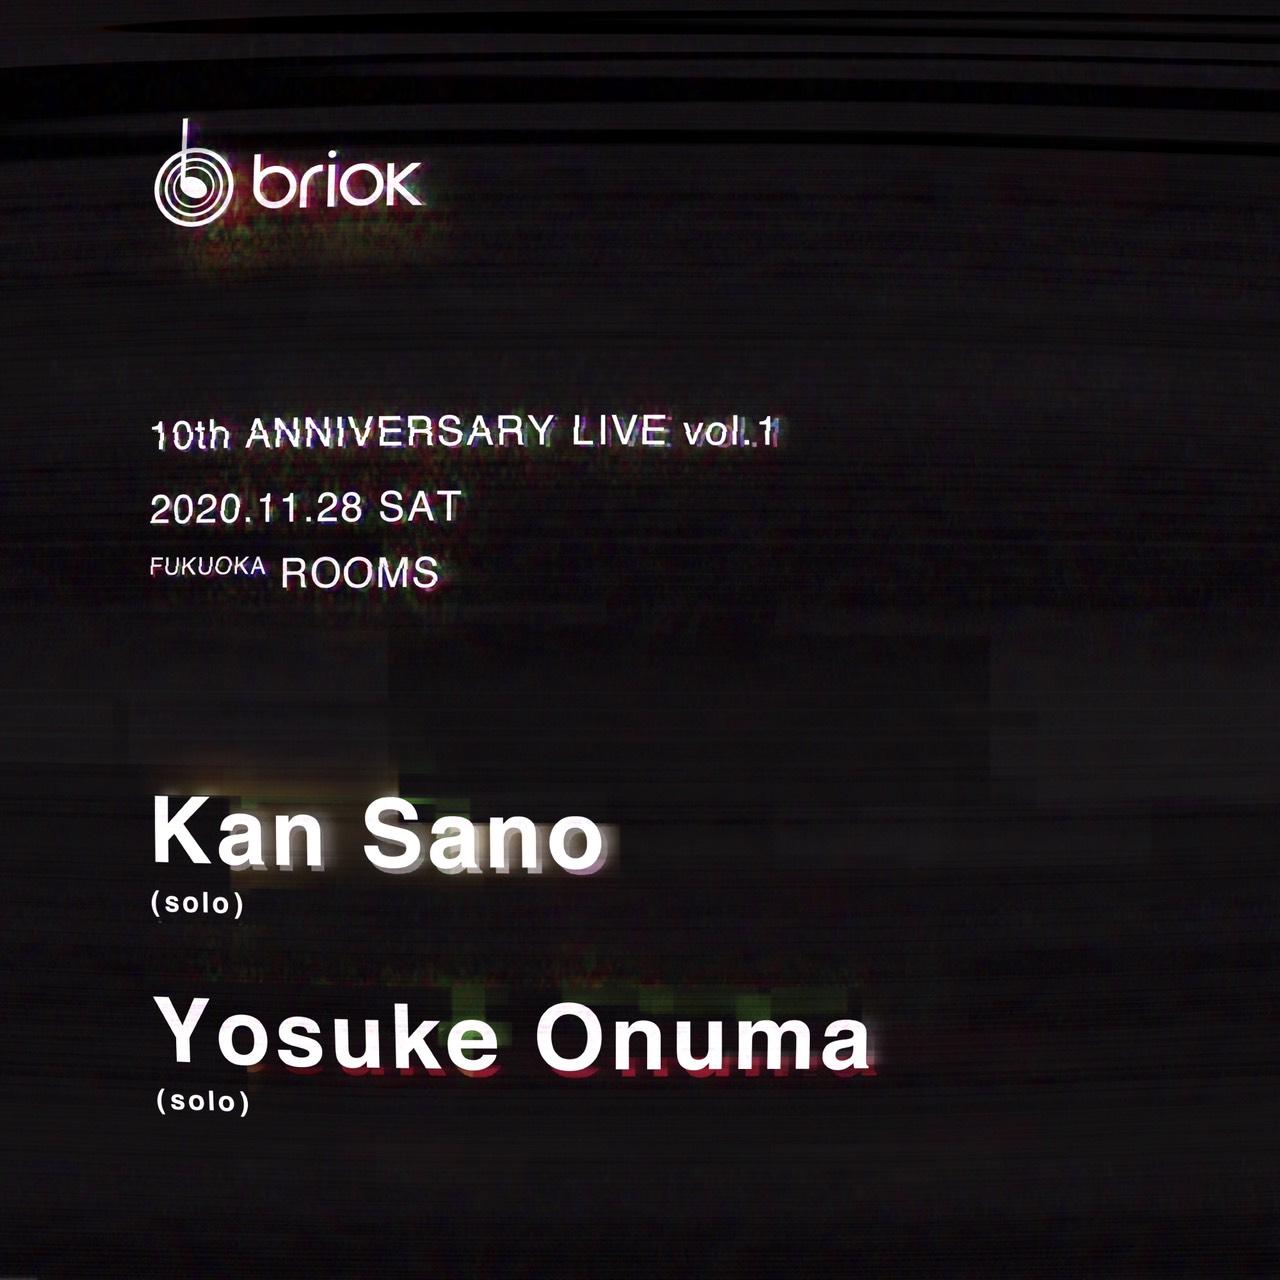 brick 10TH ANNIVERSARY LIVE vol.1 〈1st stage〉